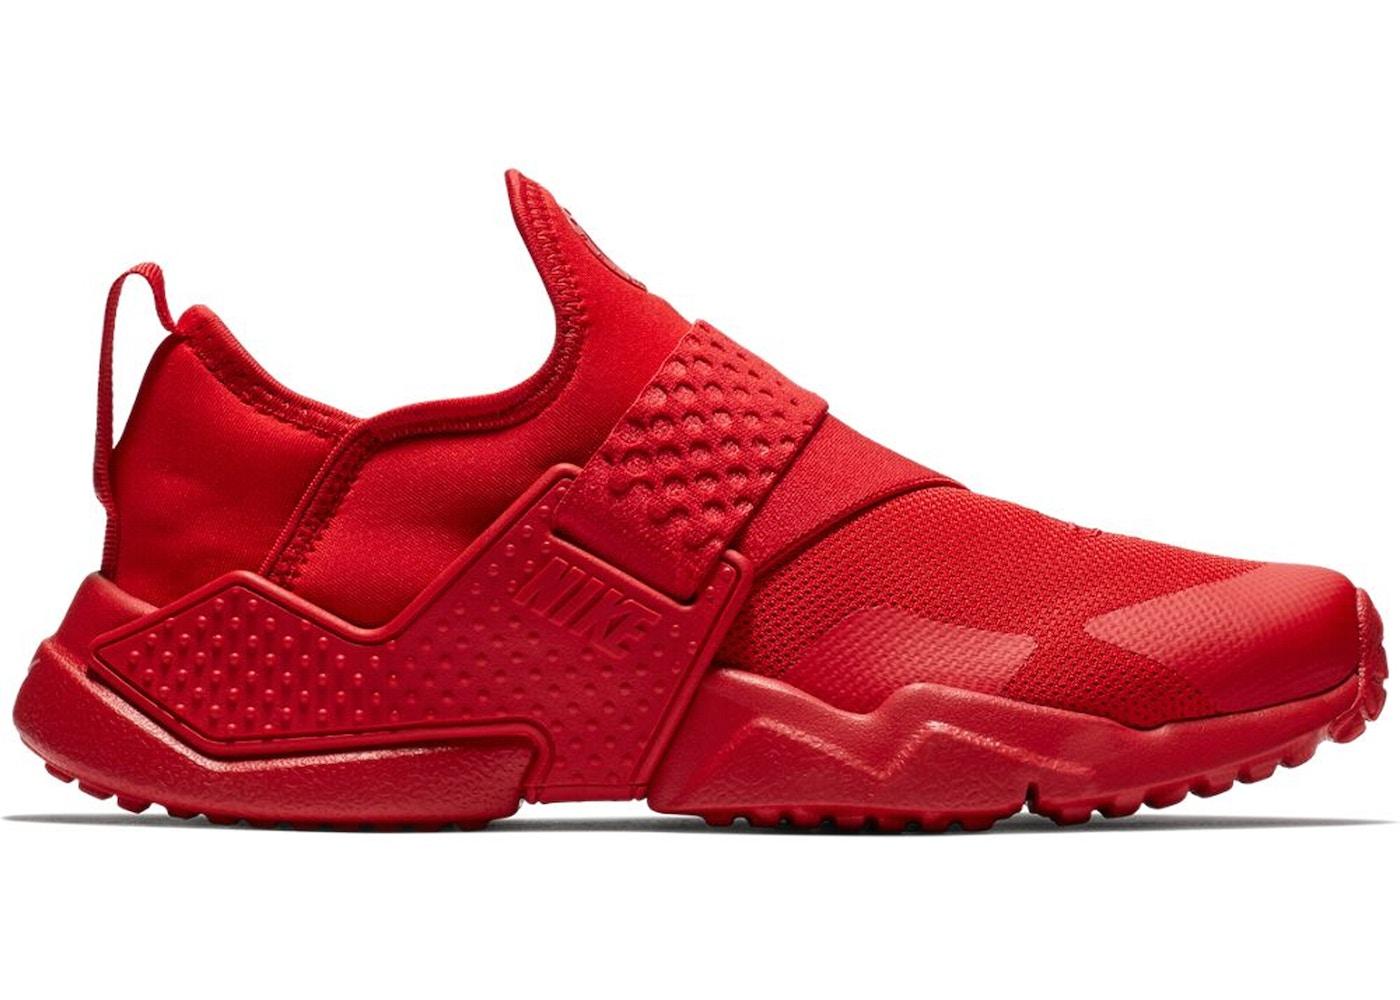 reputable site 12a5e f6fb5 Nike Huarache Extreme University Red (GS) - AQ0575-600